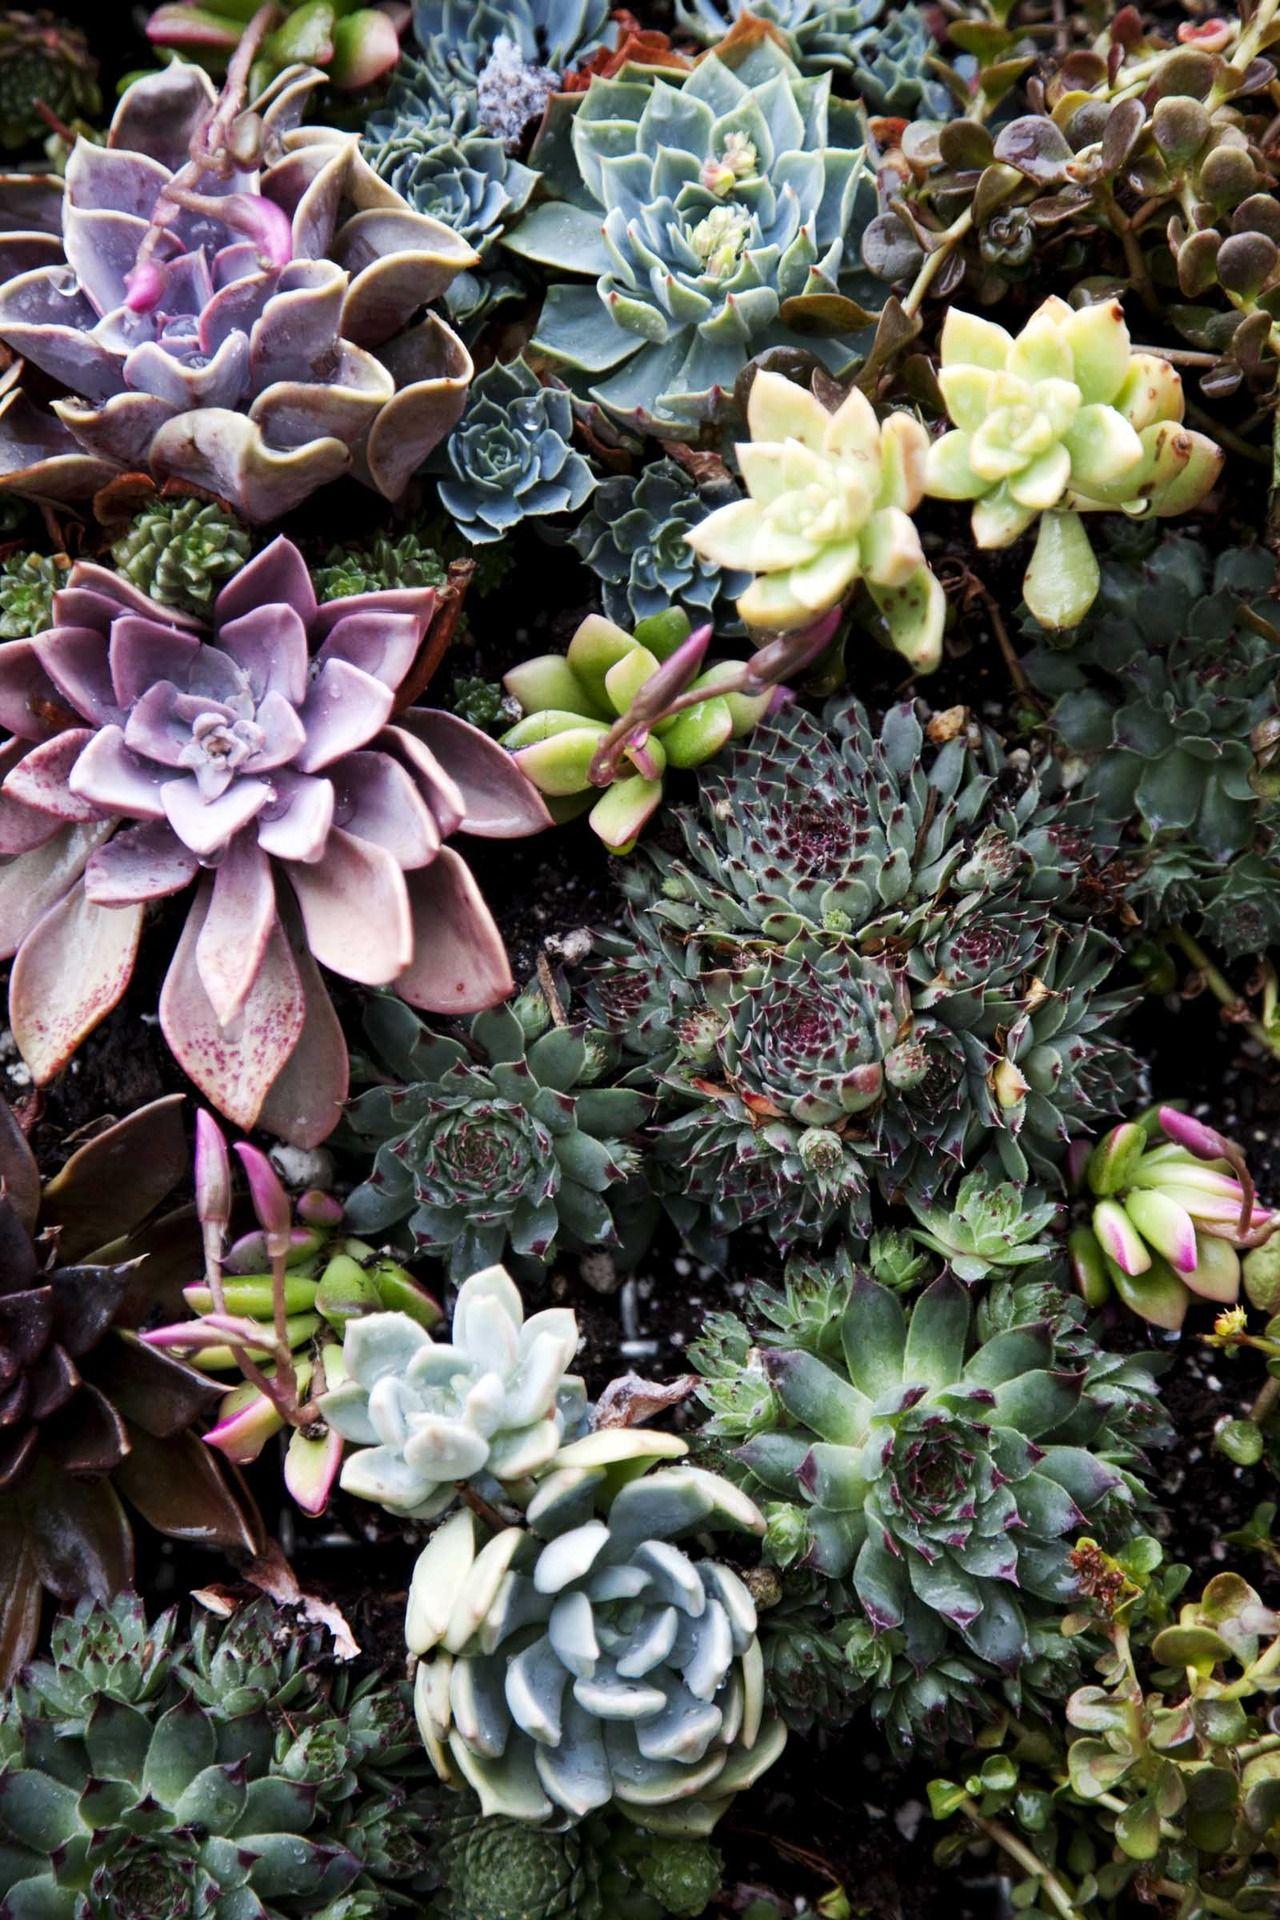 Suculentas Growing In The Garden Cactus Et Plantes Succulentes